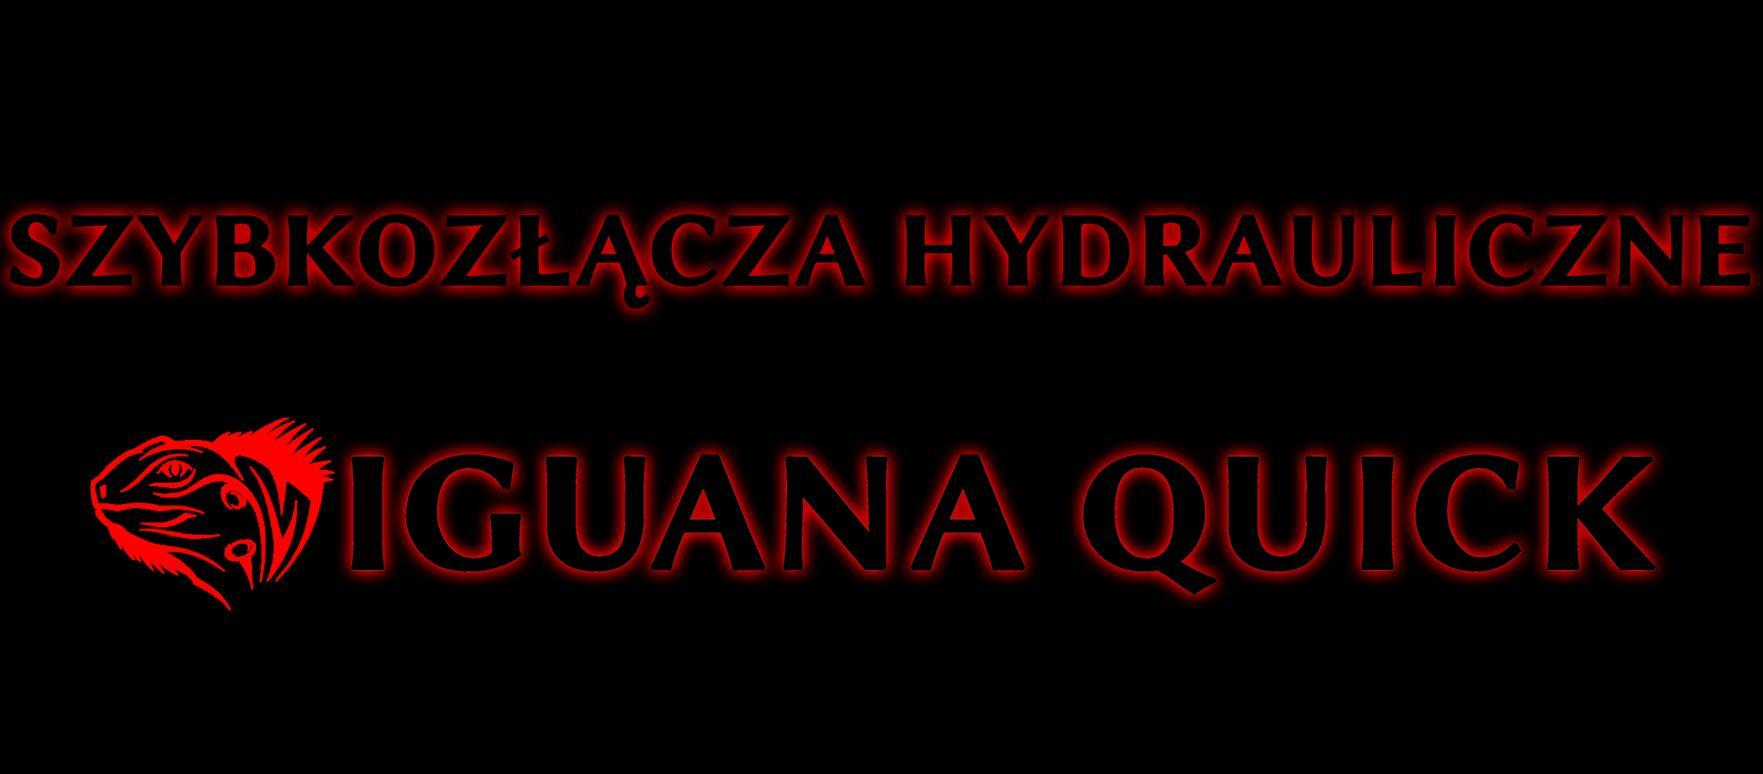 IGUANA_QUICK_baner_red.jpg